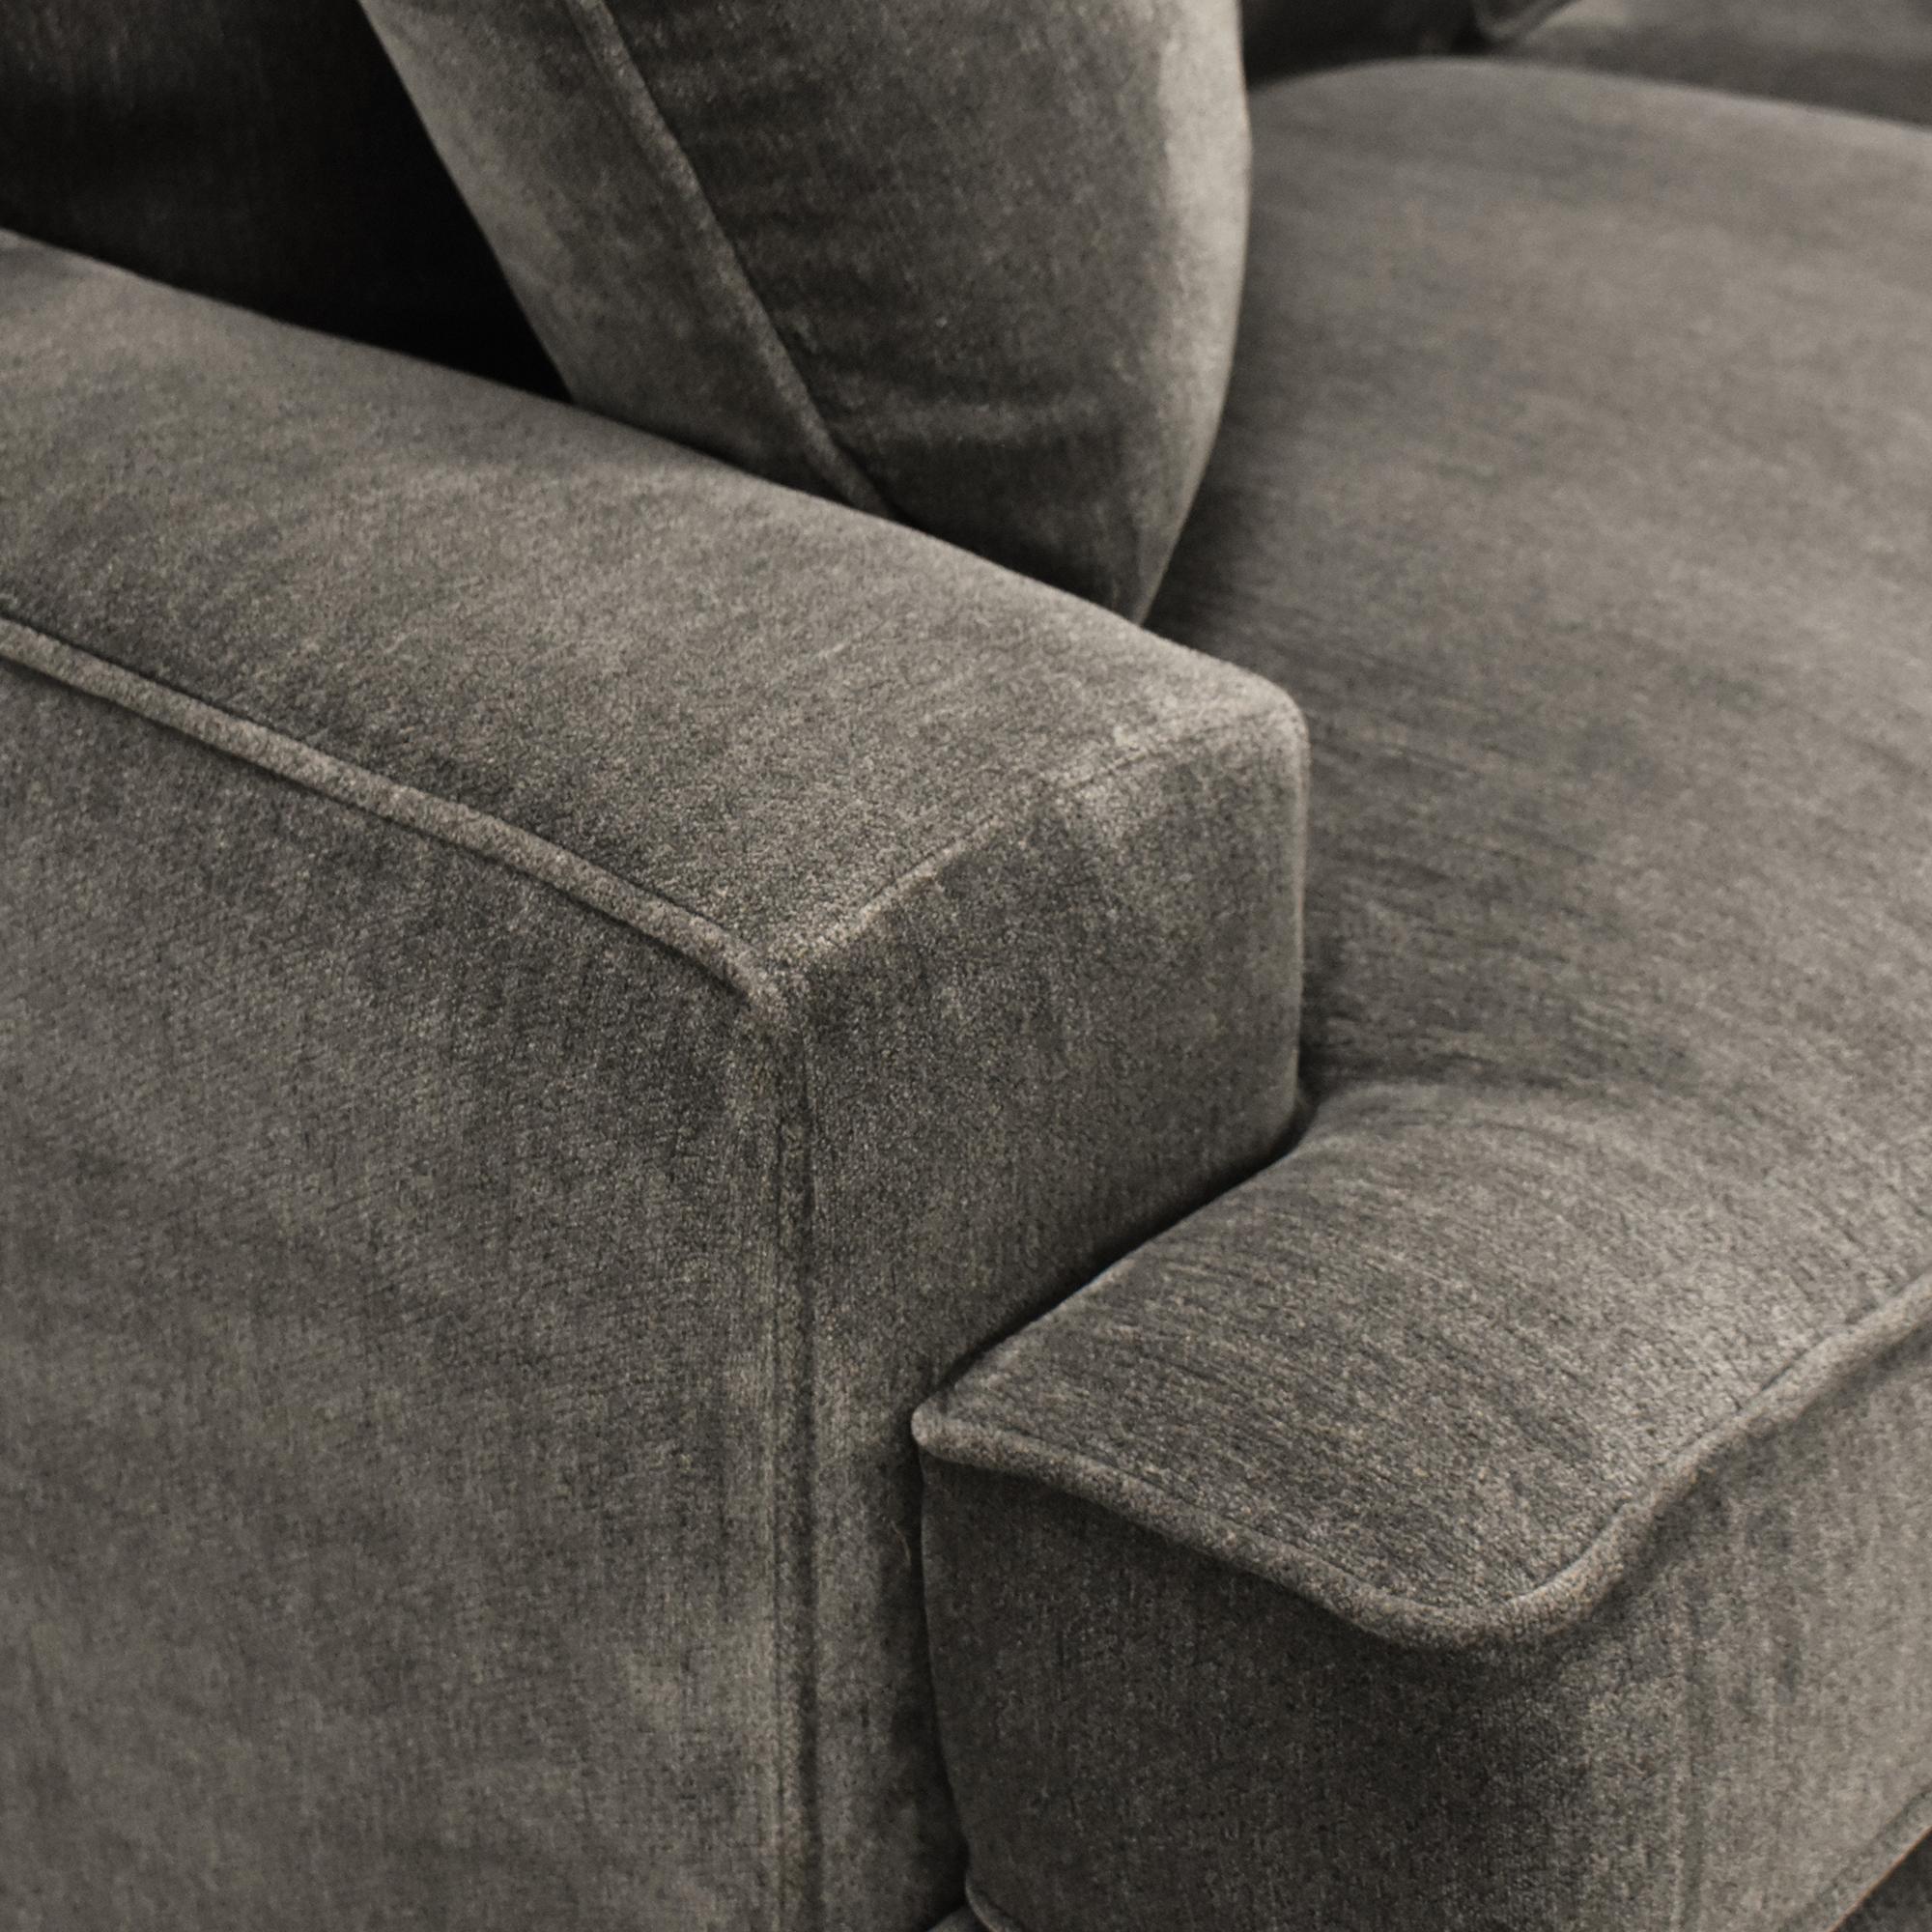 Macy's Macy's Corner Chaise Sectional Sofa nyc